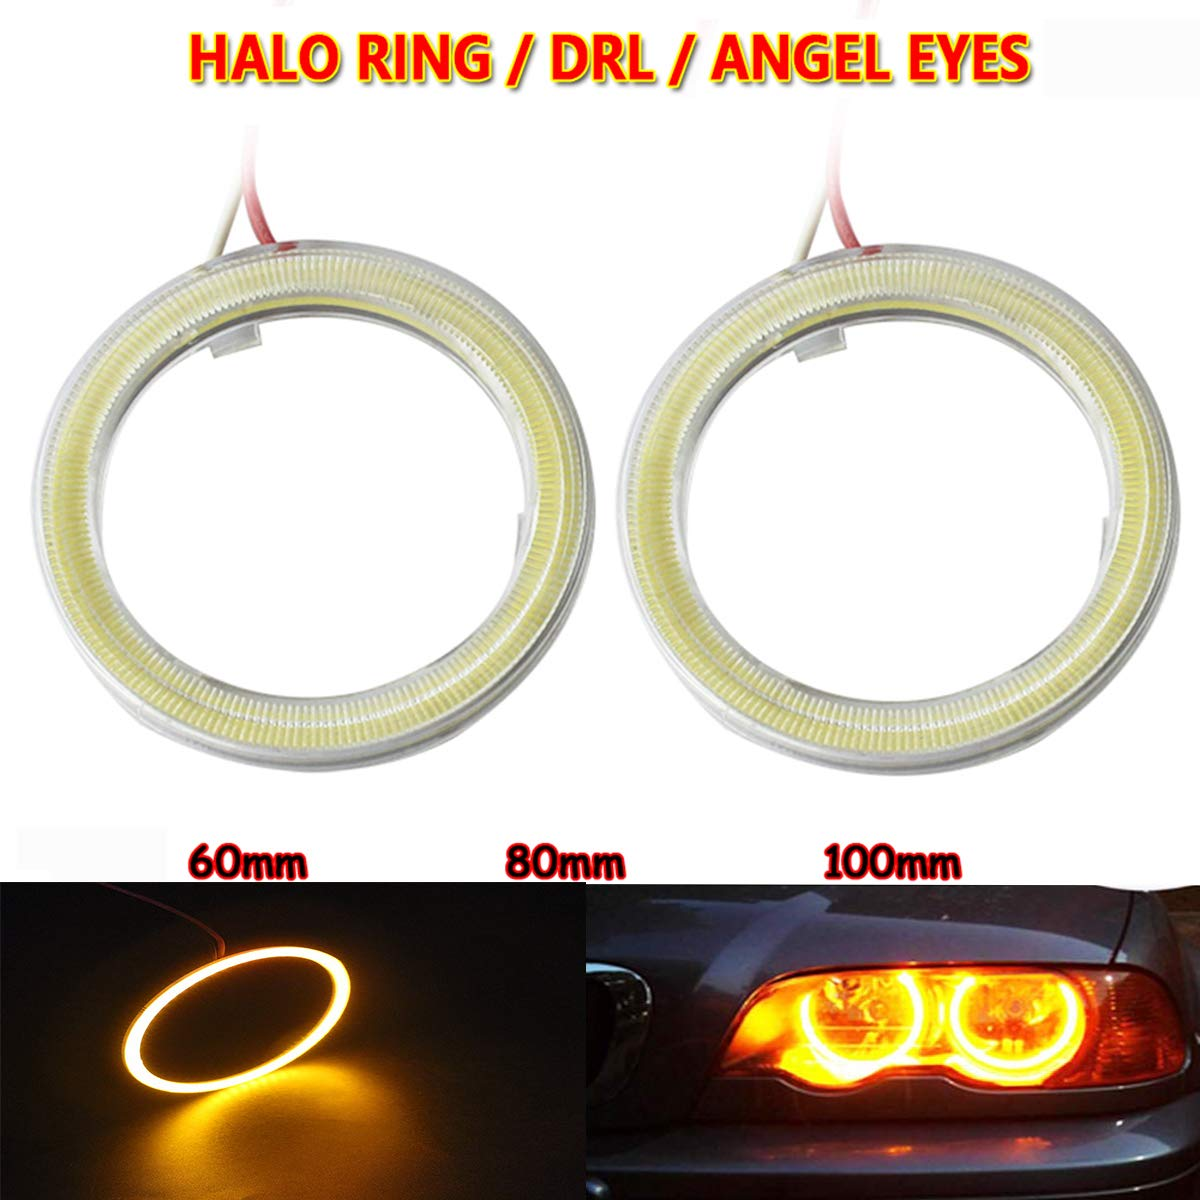 Amber, 60MM 2 Pack Car Angel Eyes Led COB Headlight Halo Ring Warning Lamp Daytime Running Lights DC 12V Circle Ring Headlight Lamp with Plastic Cover Yellow//White Lights